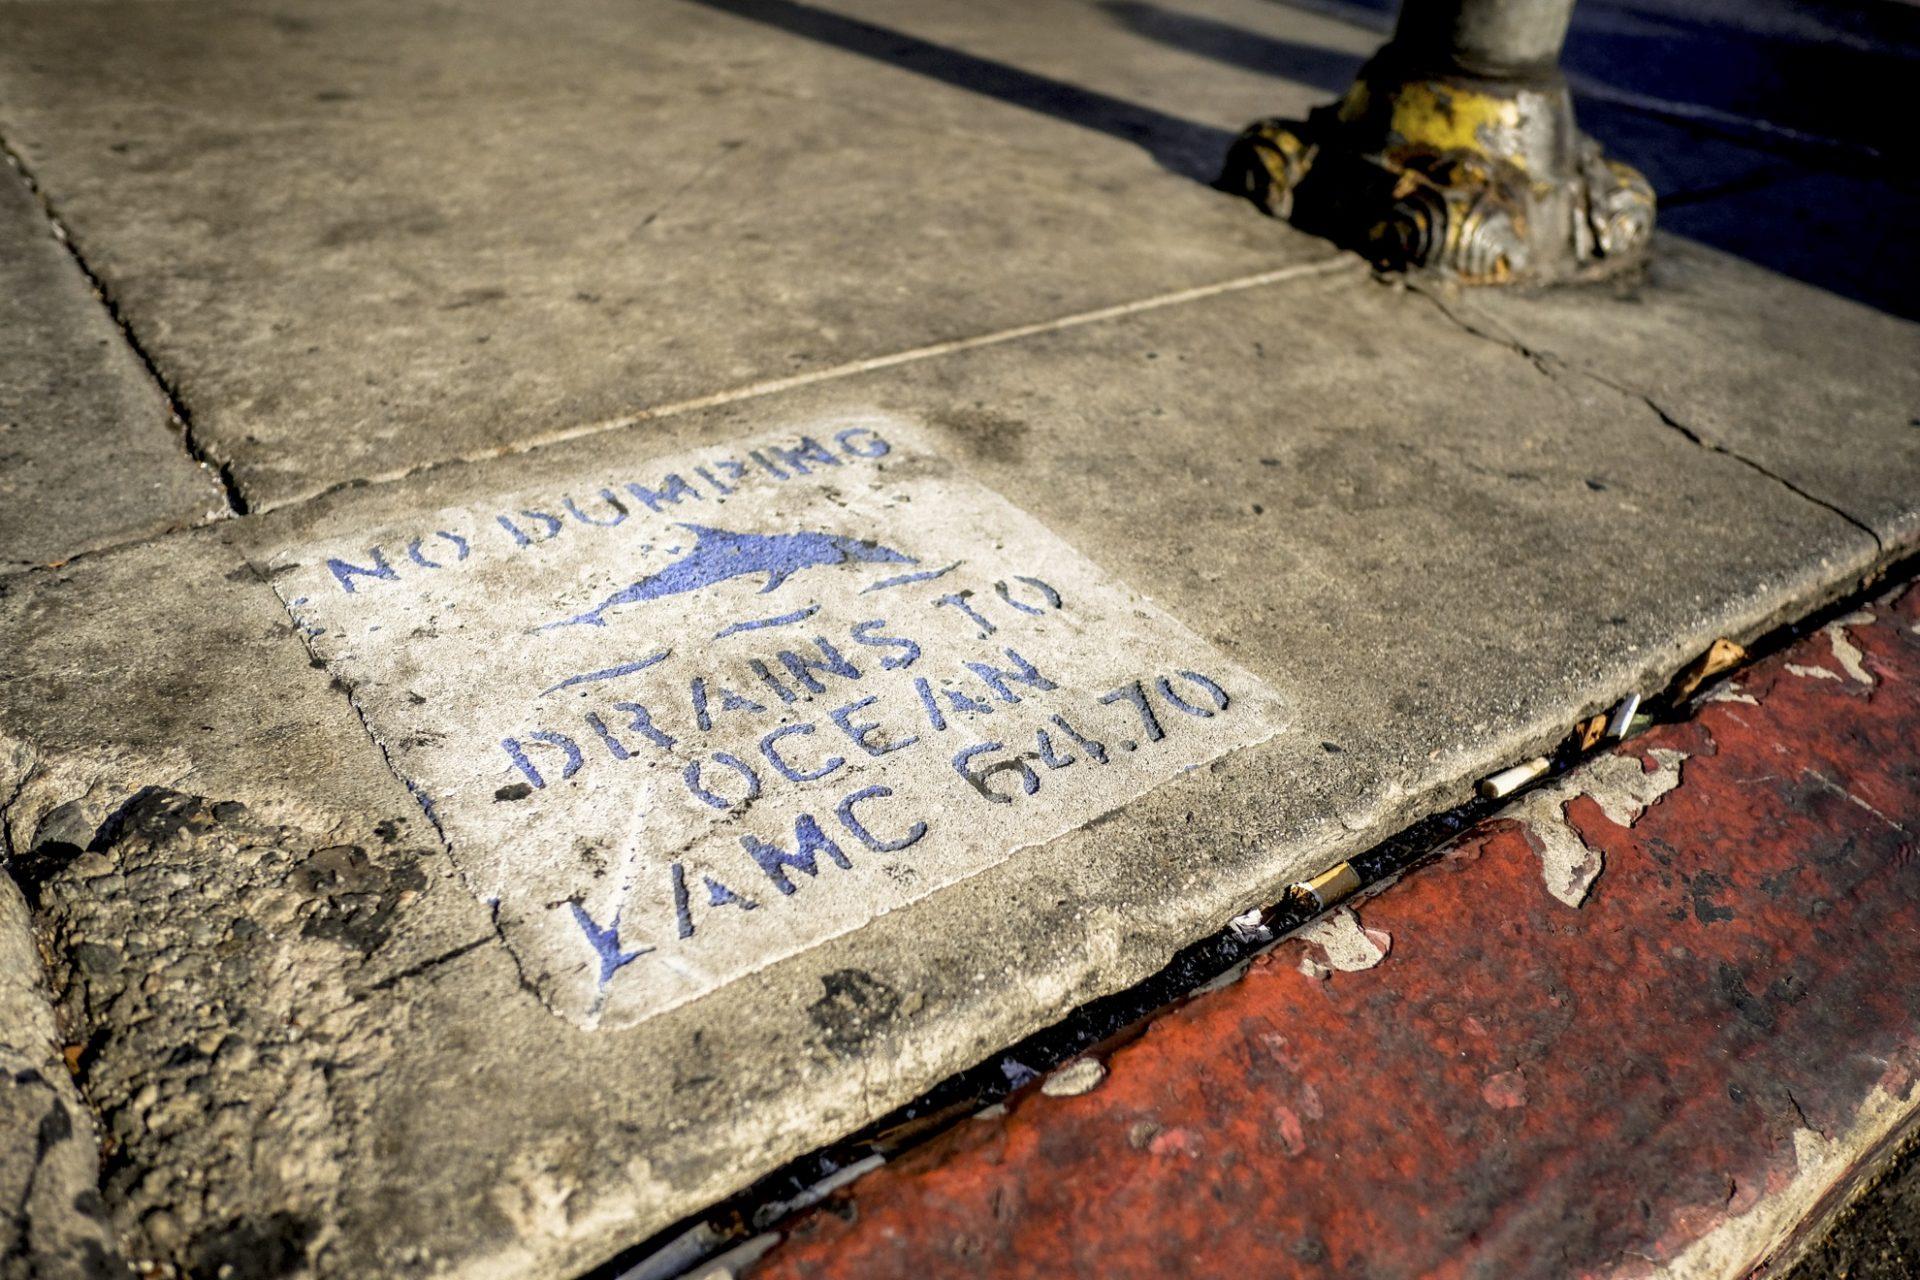 reportage L.A. @laurentparienti - 3